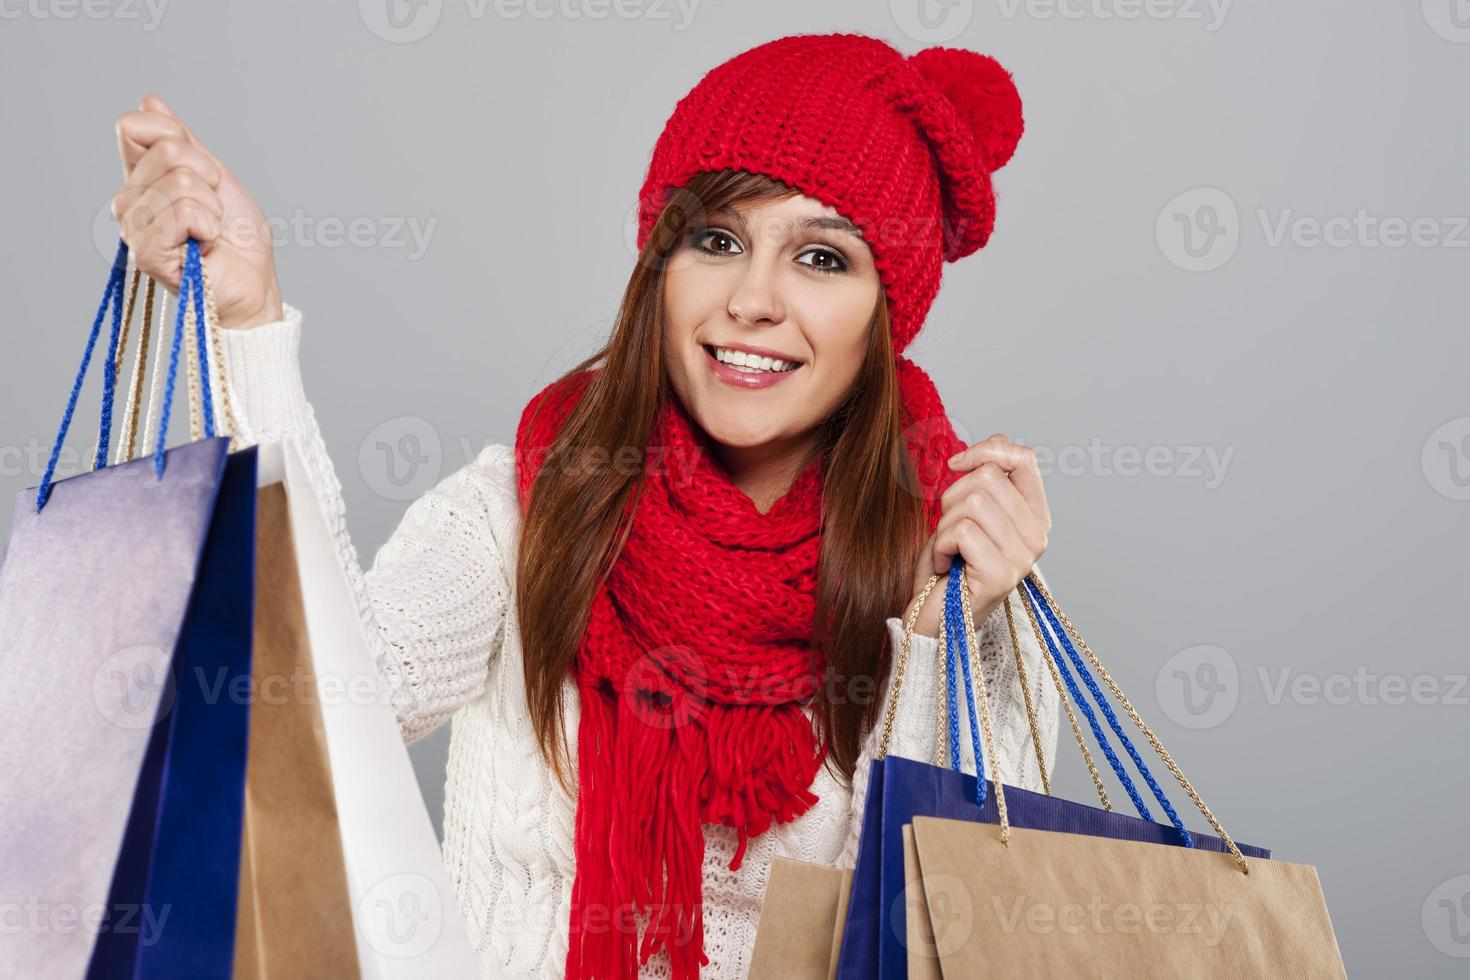 alegre shopacholic durante a venda de inverno foto